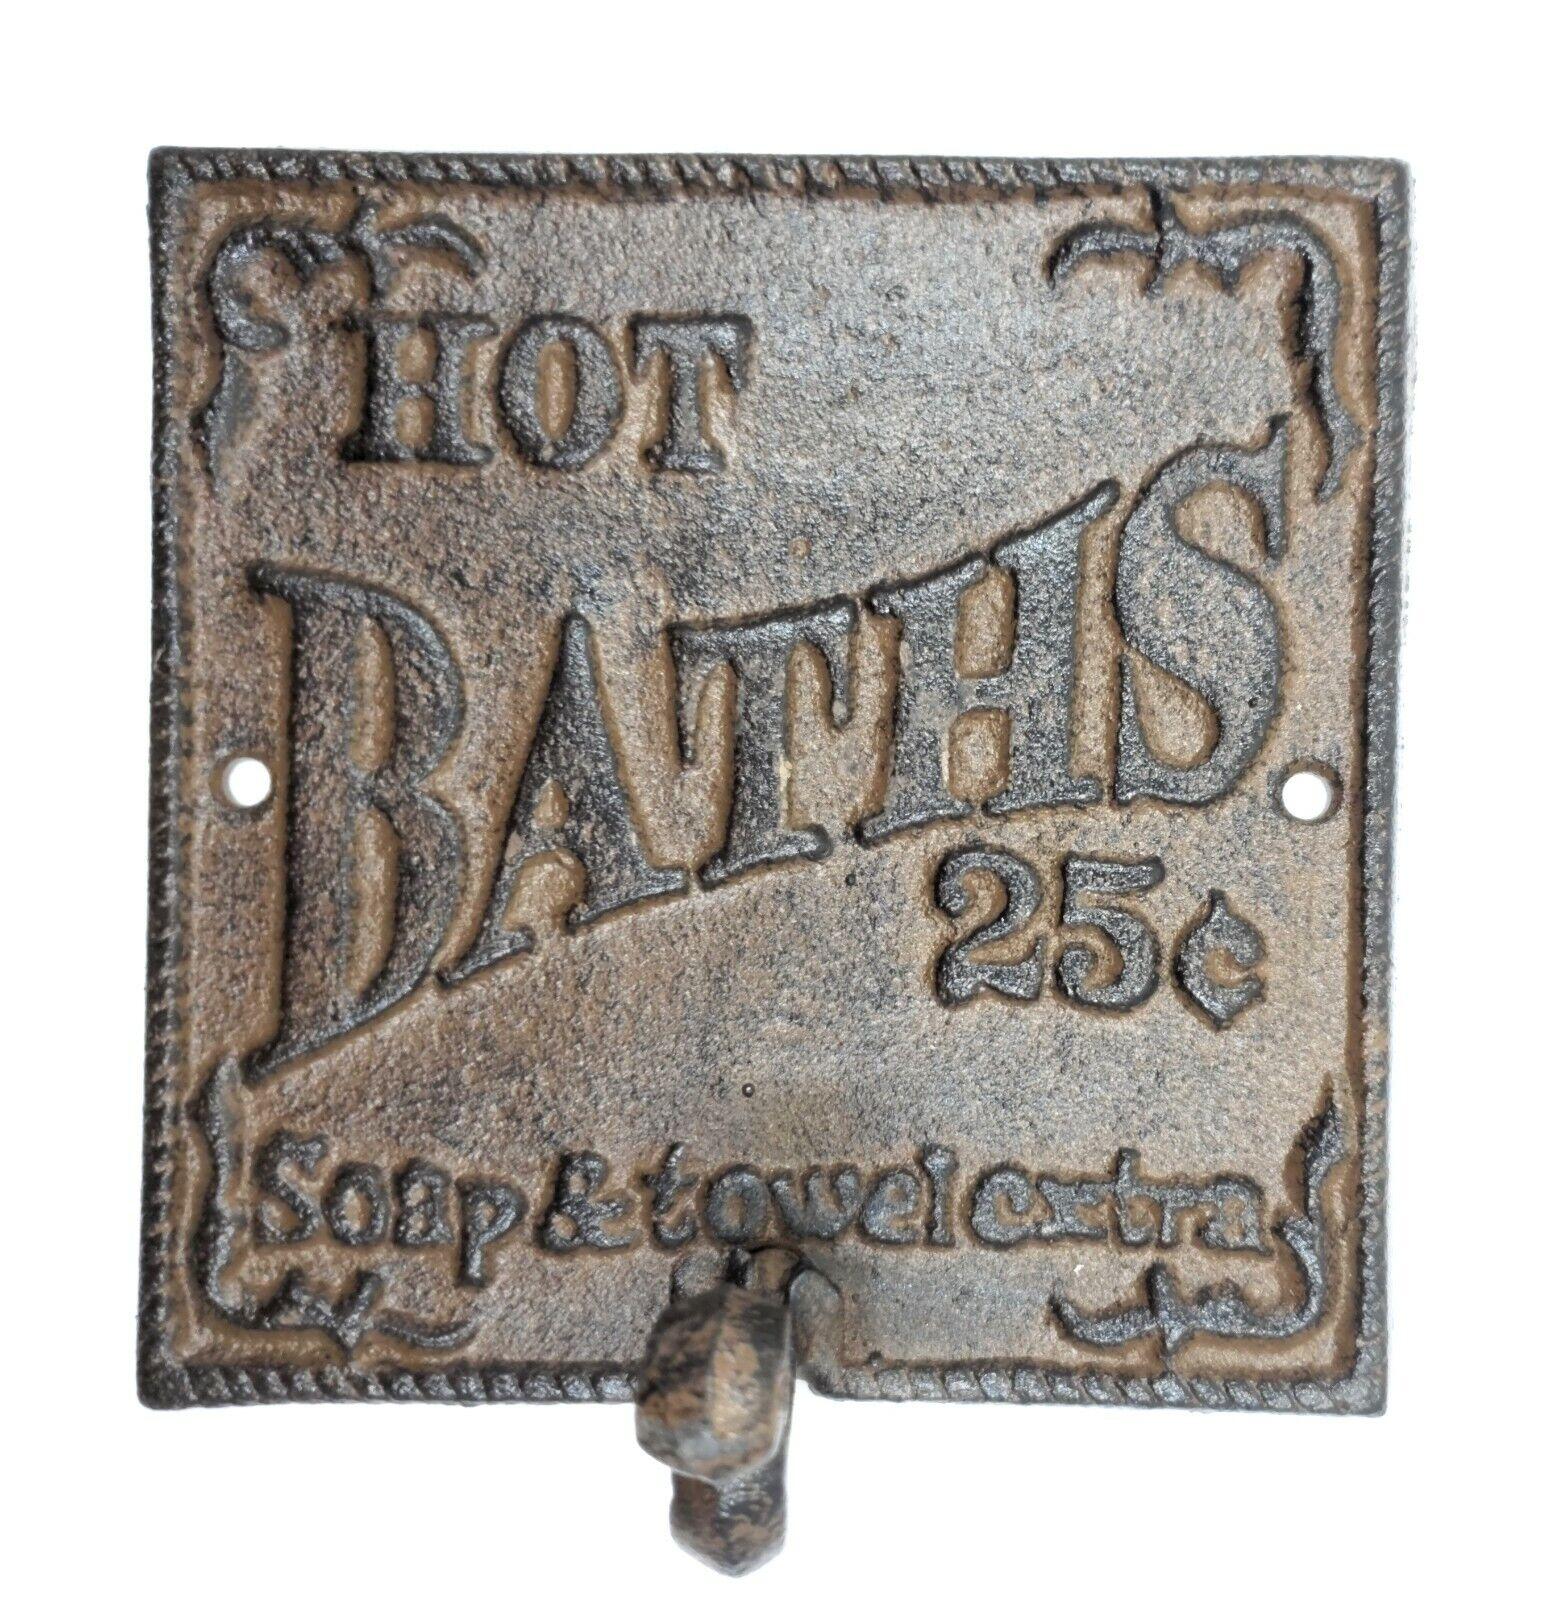 Set 4 Rustic Hot Bath Sign Hook Farmhouse Primitive Wall Bathroom Decor